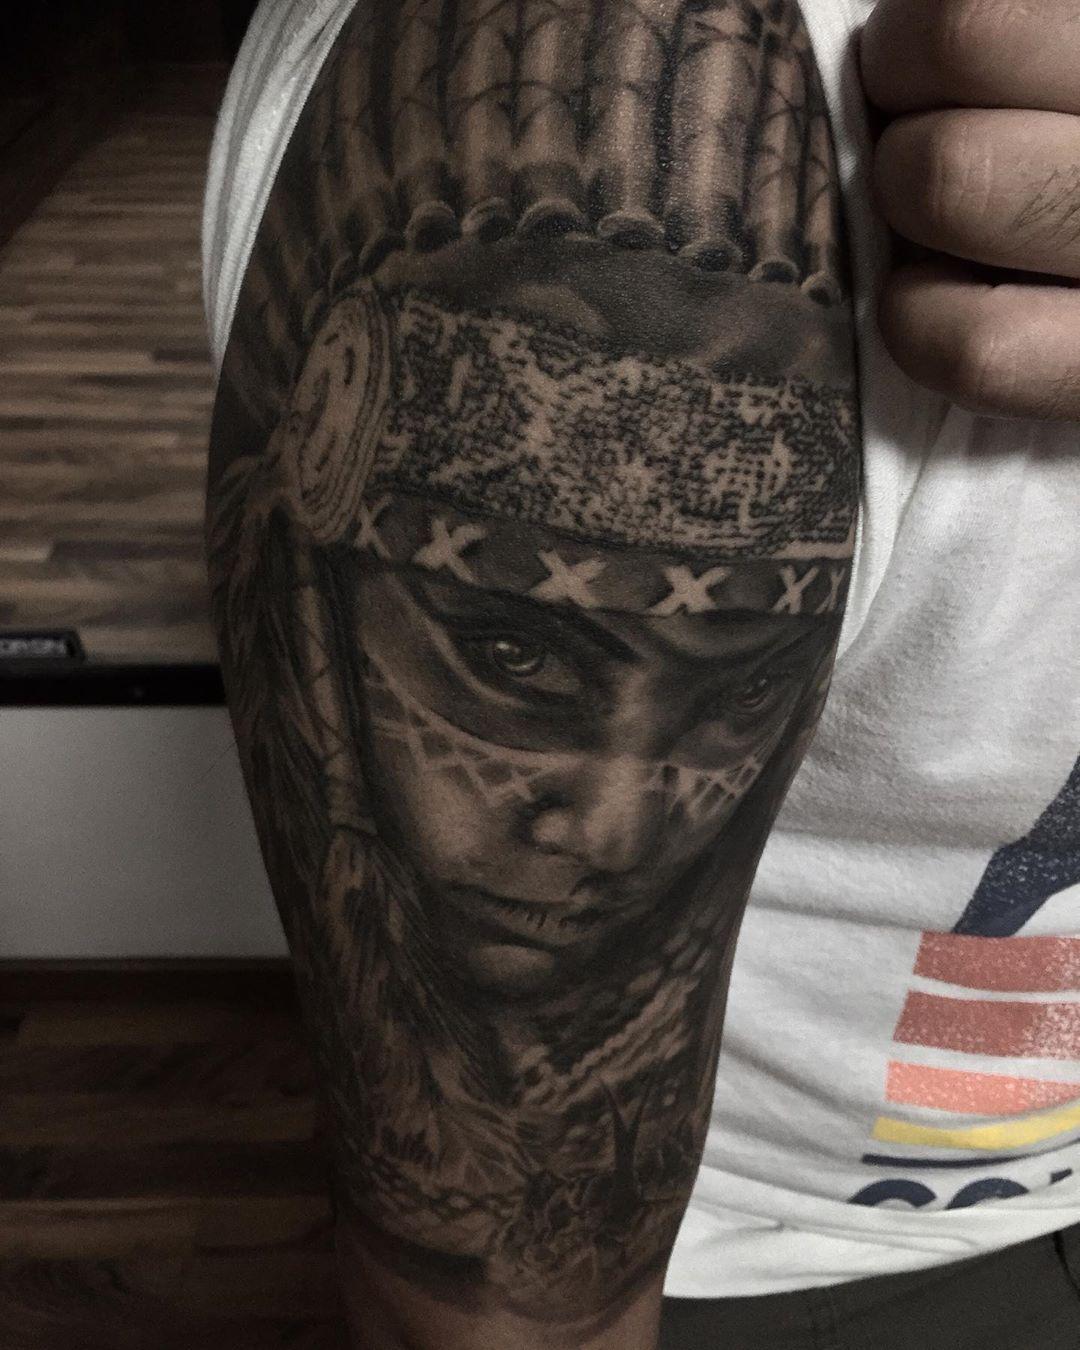 Pieza cicatrizada hecha hace más de un año  #tattoostyle #tattoosleeve #blackandgreyink #tattoosofinstagram #blackandgreyrealism #blackandgreytattooartist #blackandgreyartist